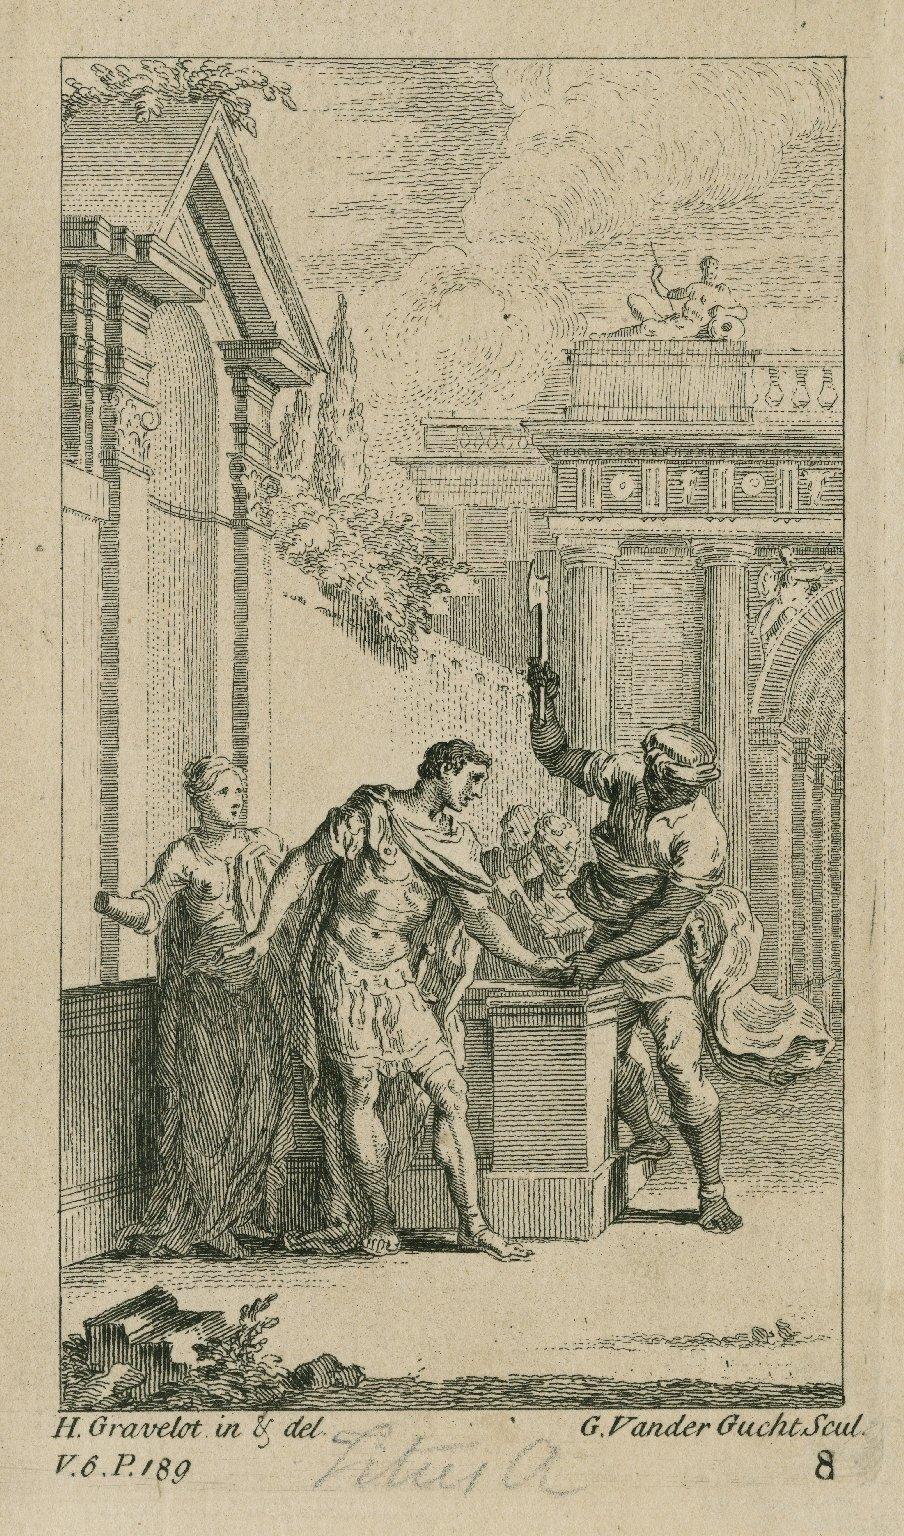 [Titus Andronicus, act III, scene 1] [graphic] / H. Gravelot in & del. ; G. Vander Gucht Scul.